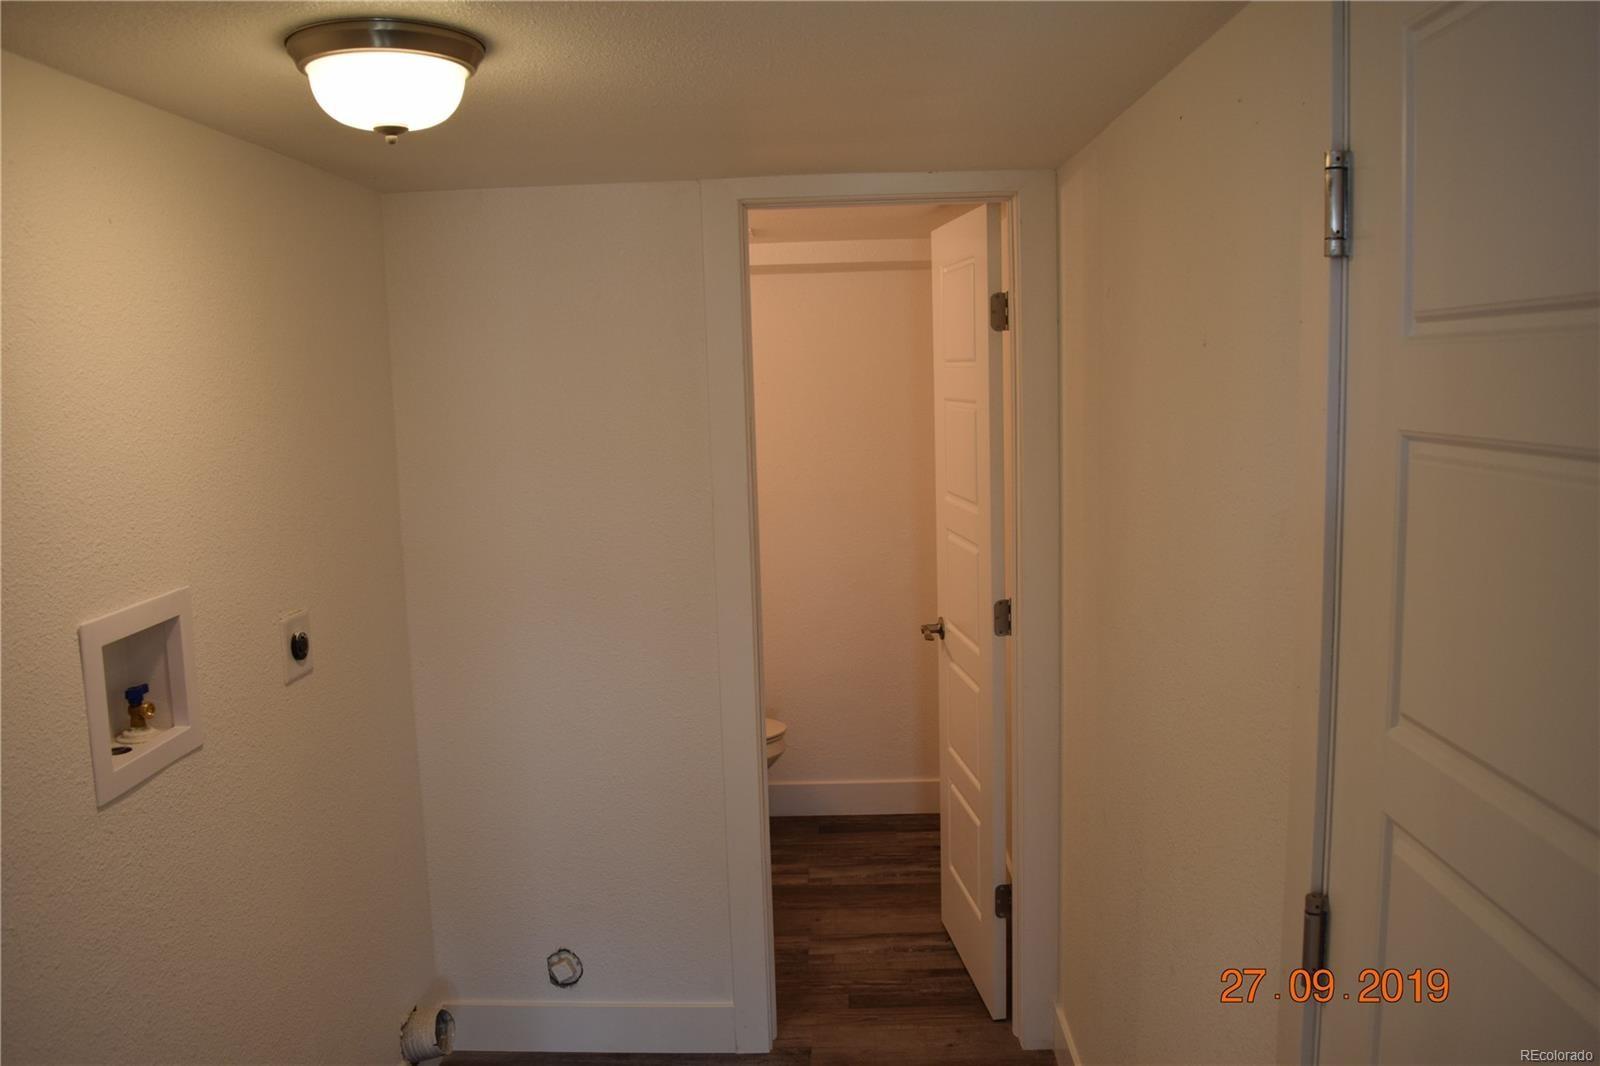 MLS# 9616472 - 17 - 8026 W Calhoun Place, Littleton, CO 80123